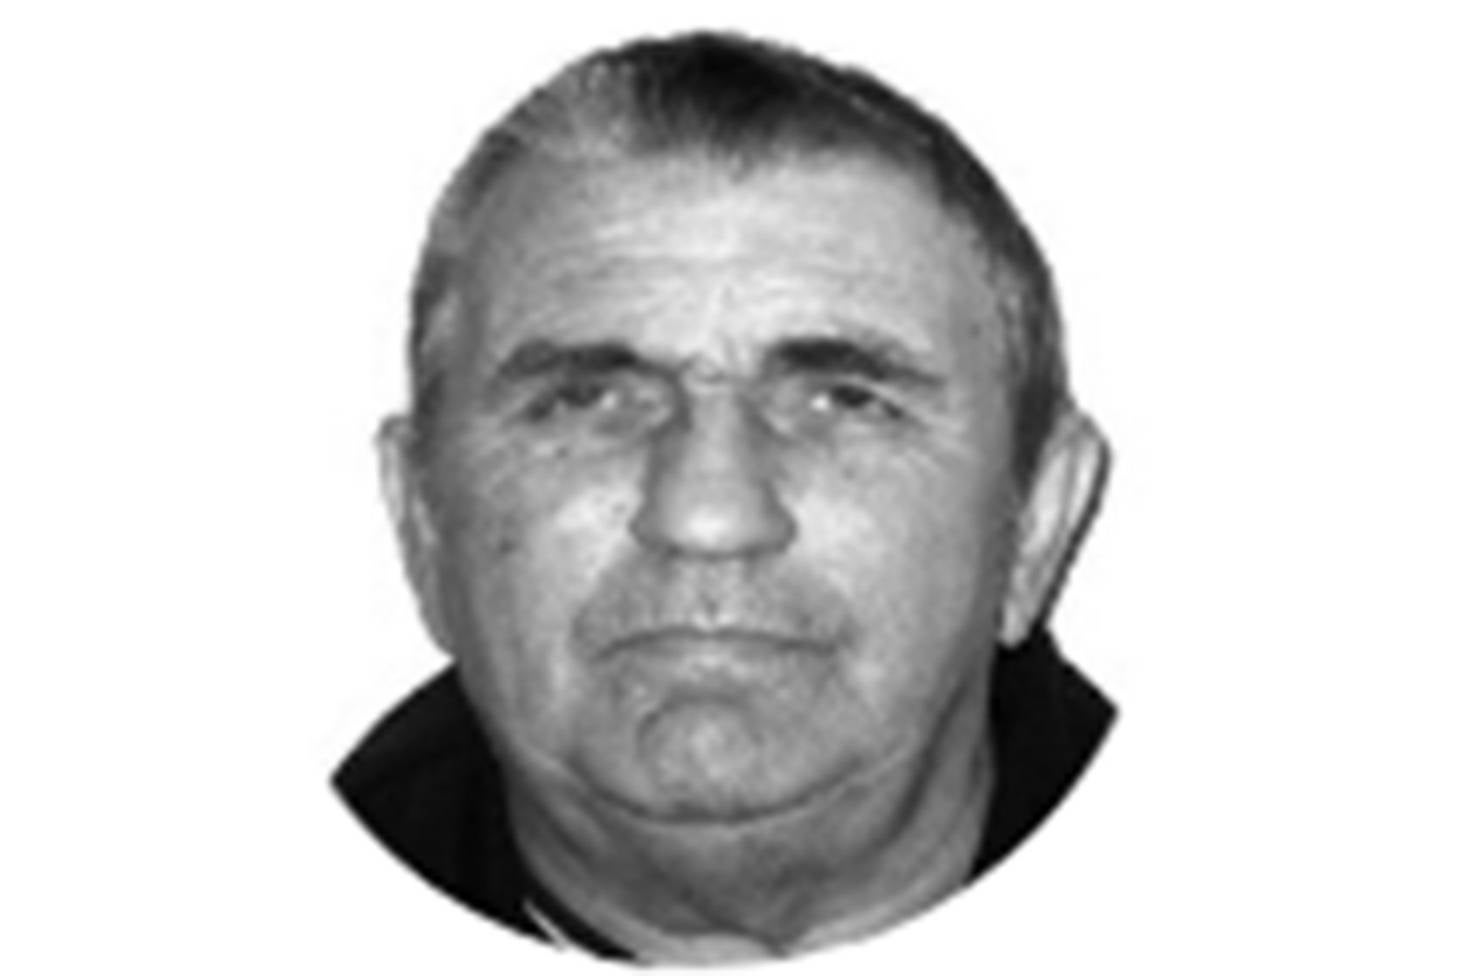 Pensioner's head was like a 'trophy' to a drug addled killer | Stuff